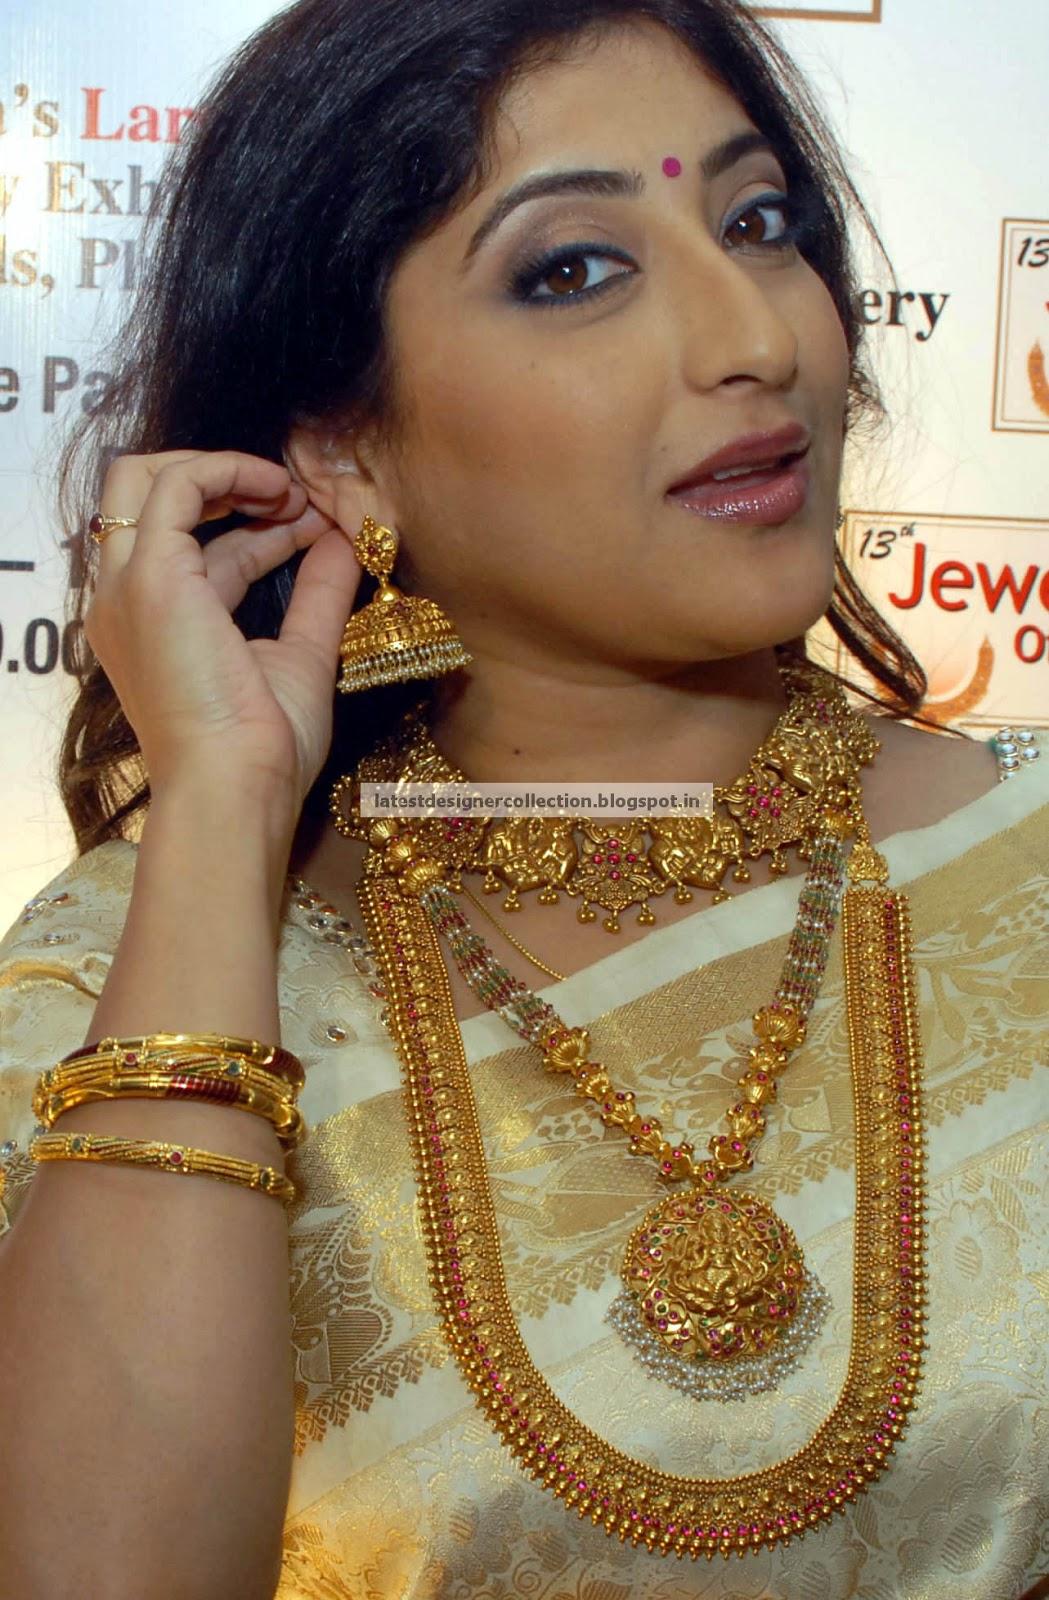 Malabar gold jewellery designs dubai -  Malabar Gold Models Latest Indian Clothing And Jewellery Designs